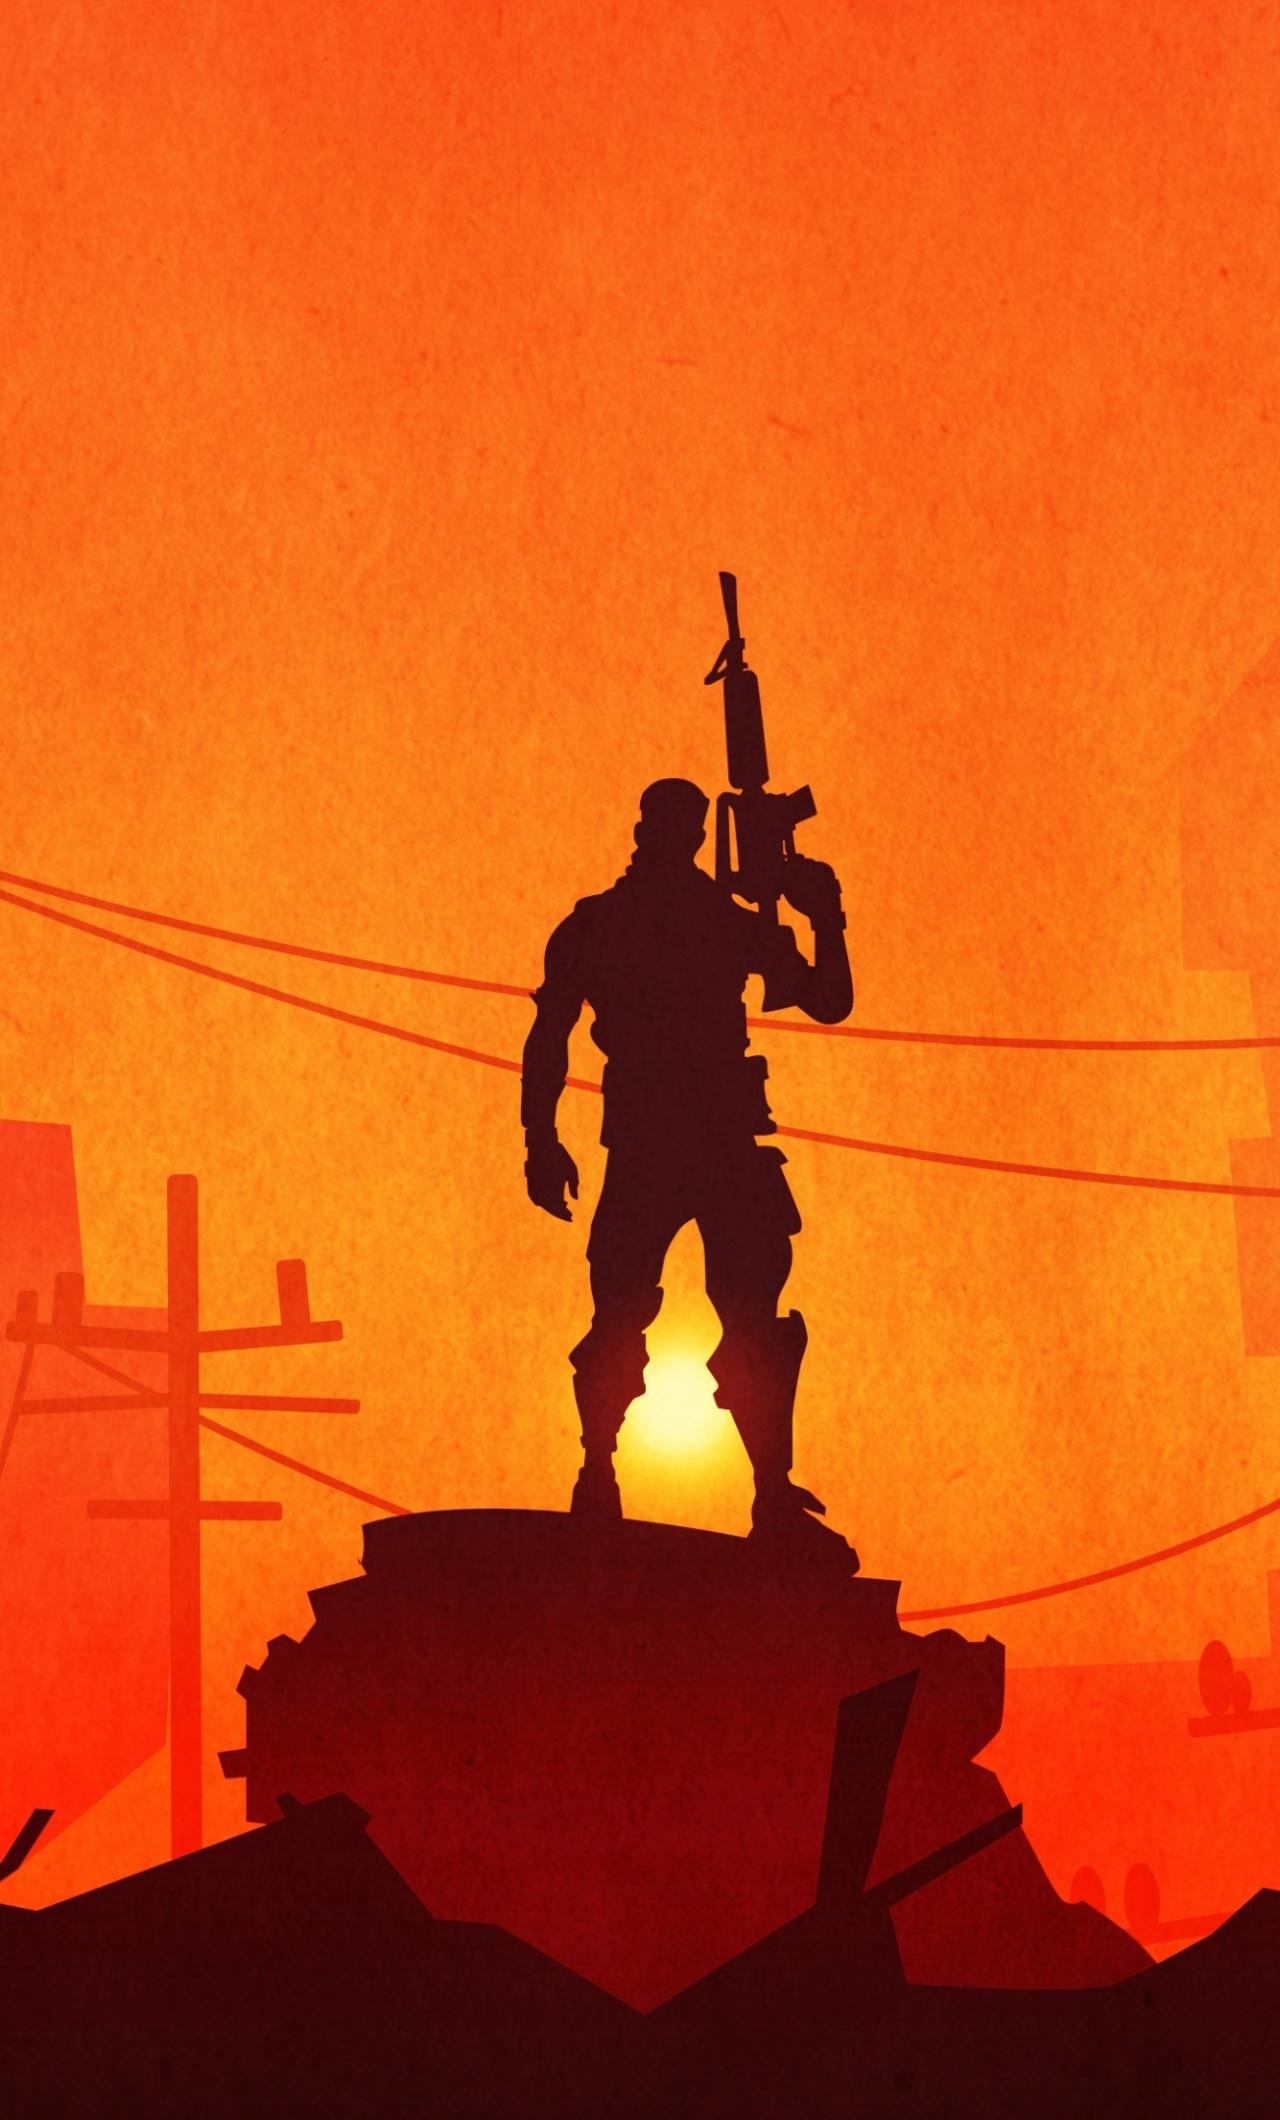 Download 1280x2120 Wallpaper Fortnite Silhouette Video Game